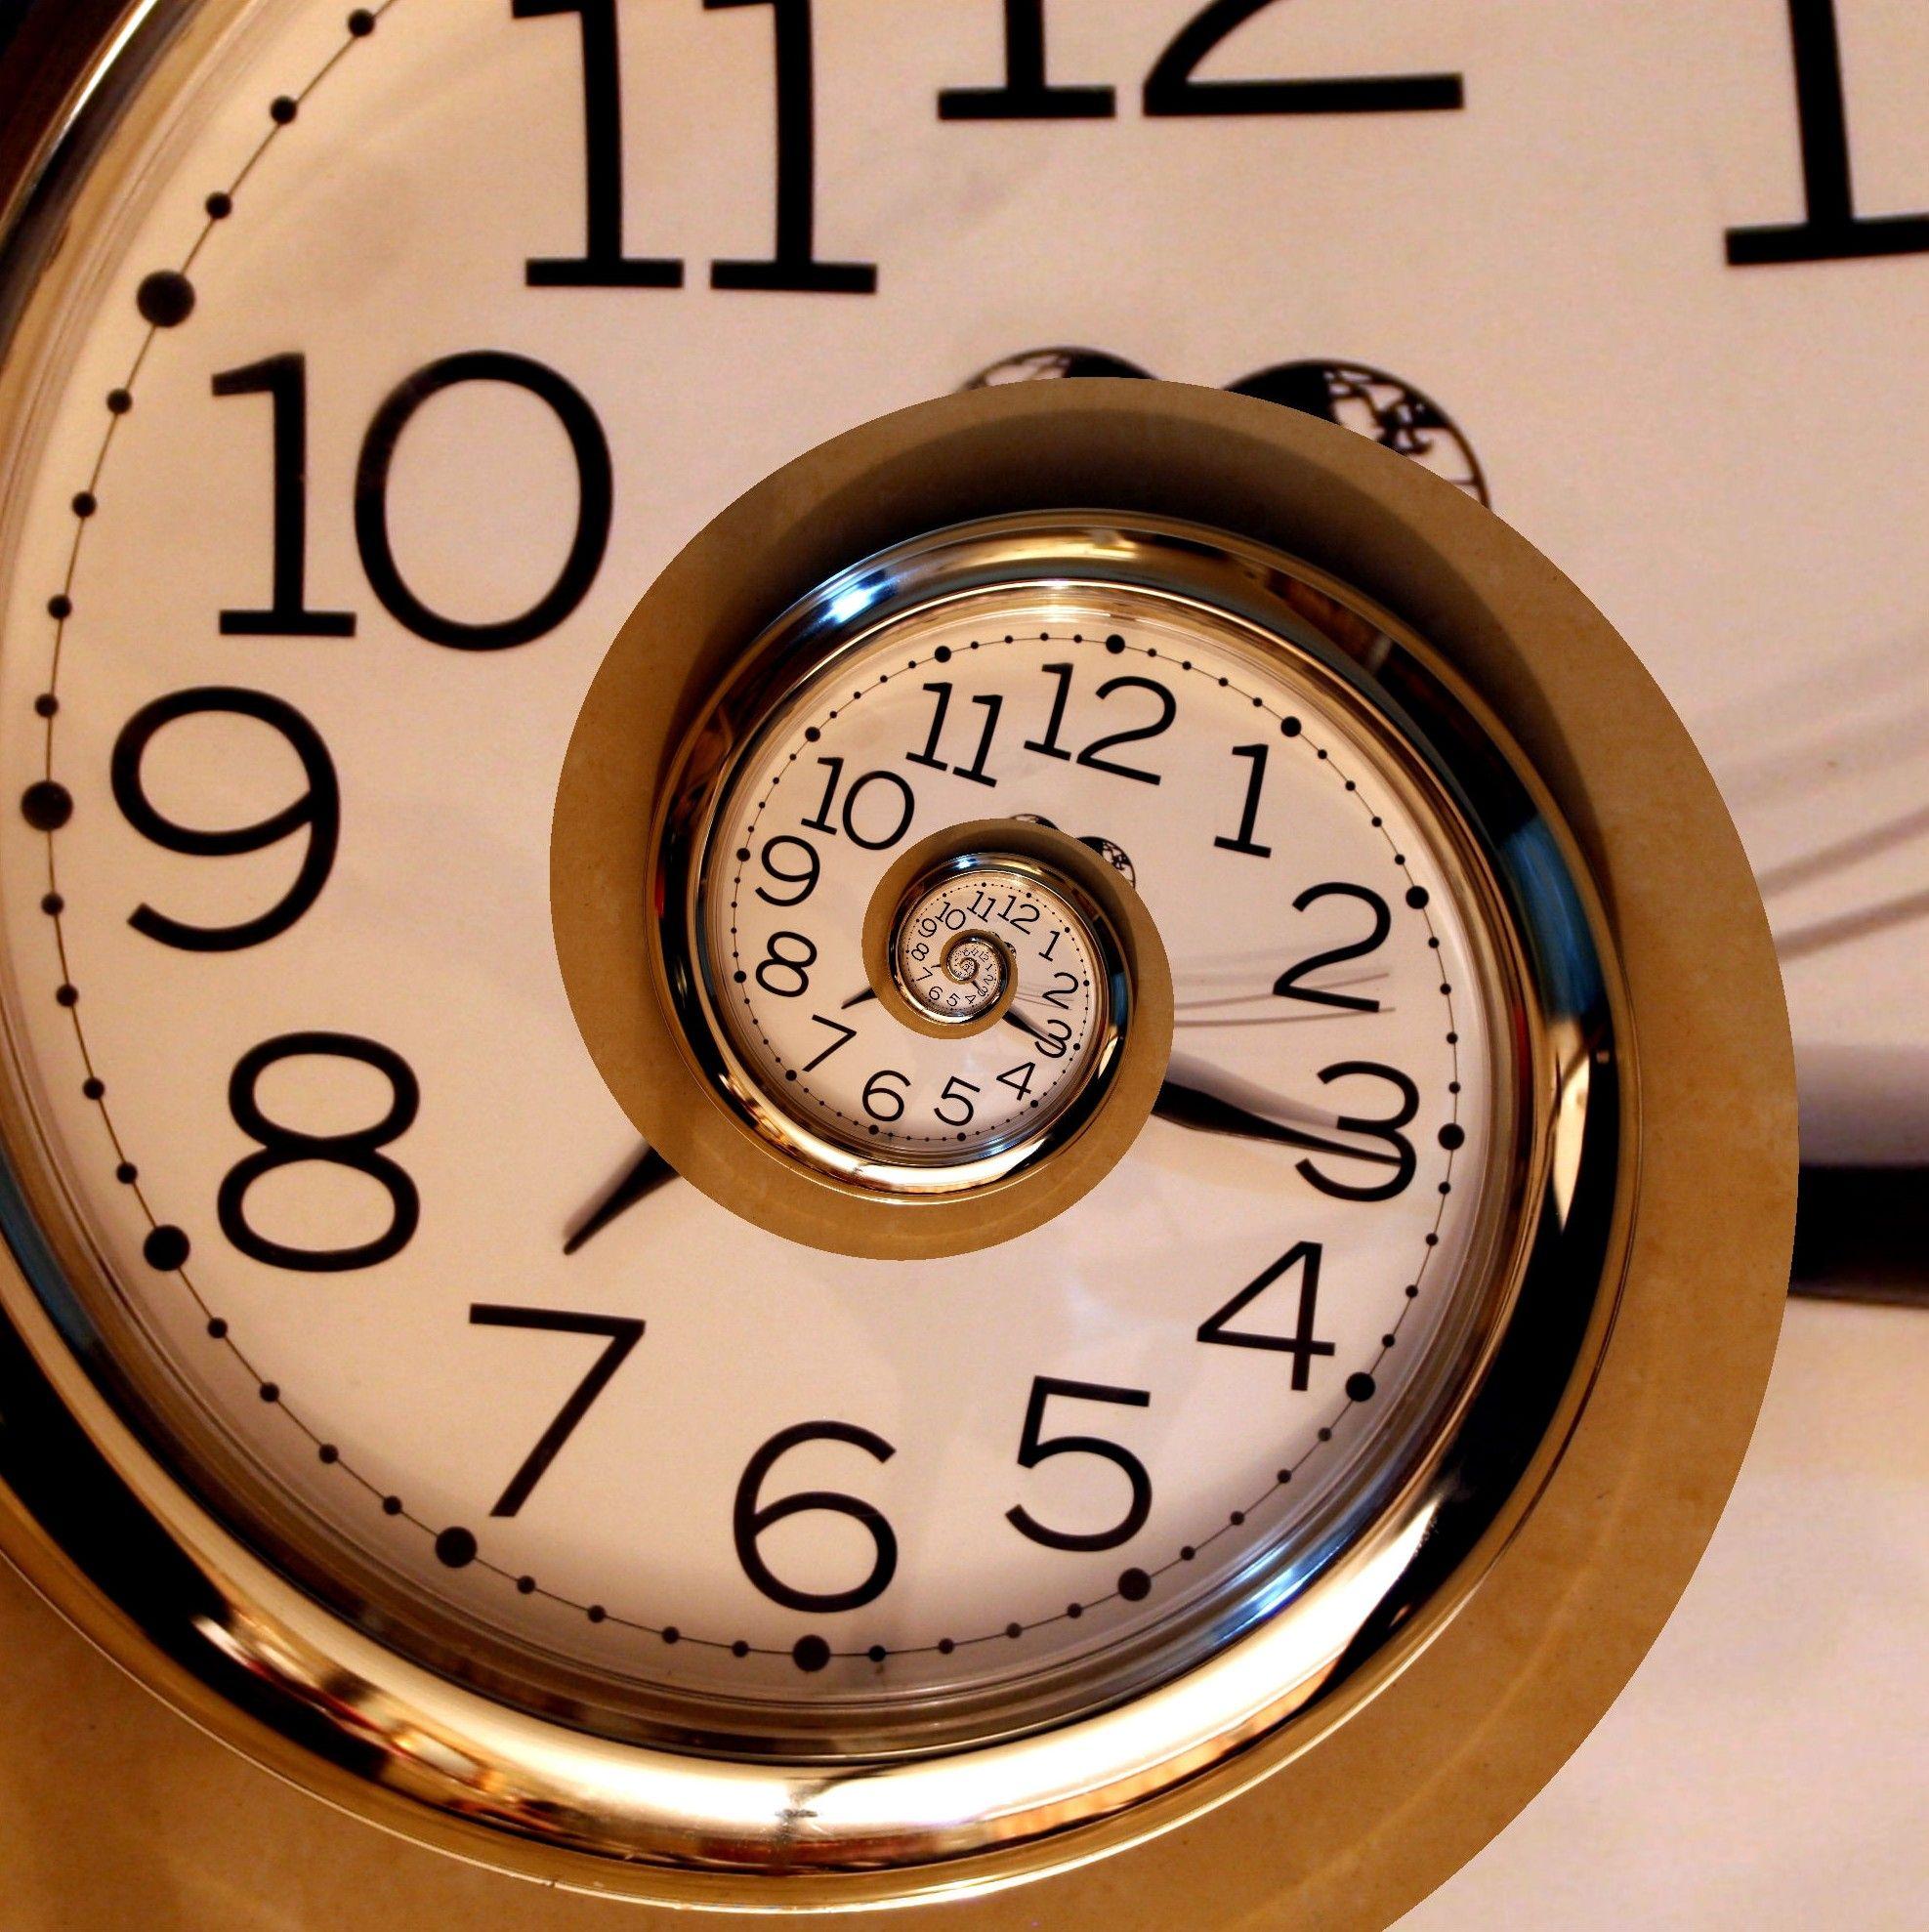 Grandfather-Clock-Tattoo-Graphic-4.jpg